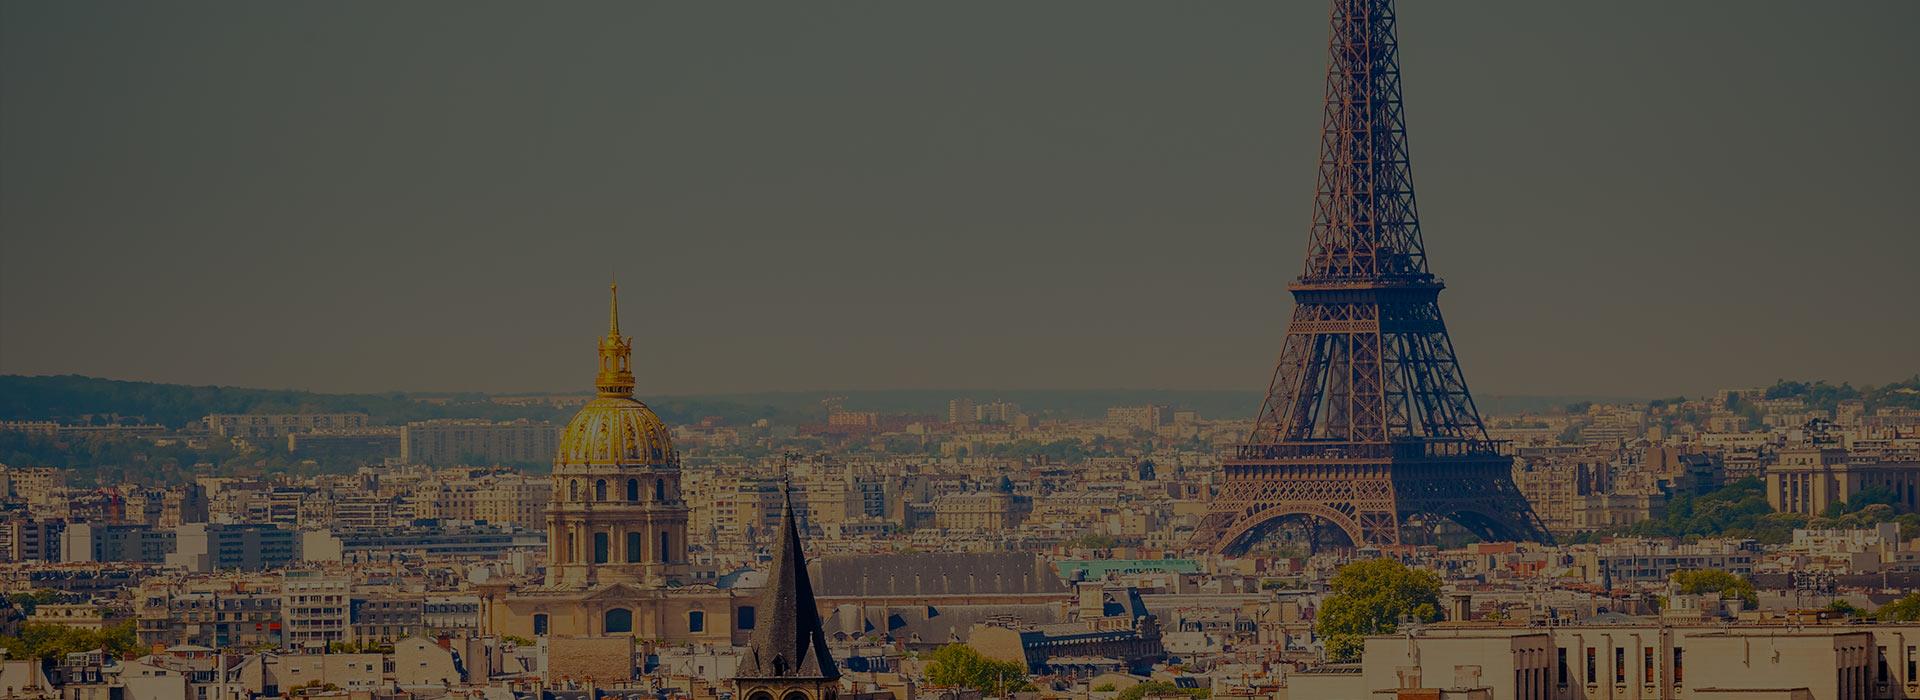 agence-innov-events-paris-ile-de-france